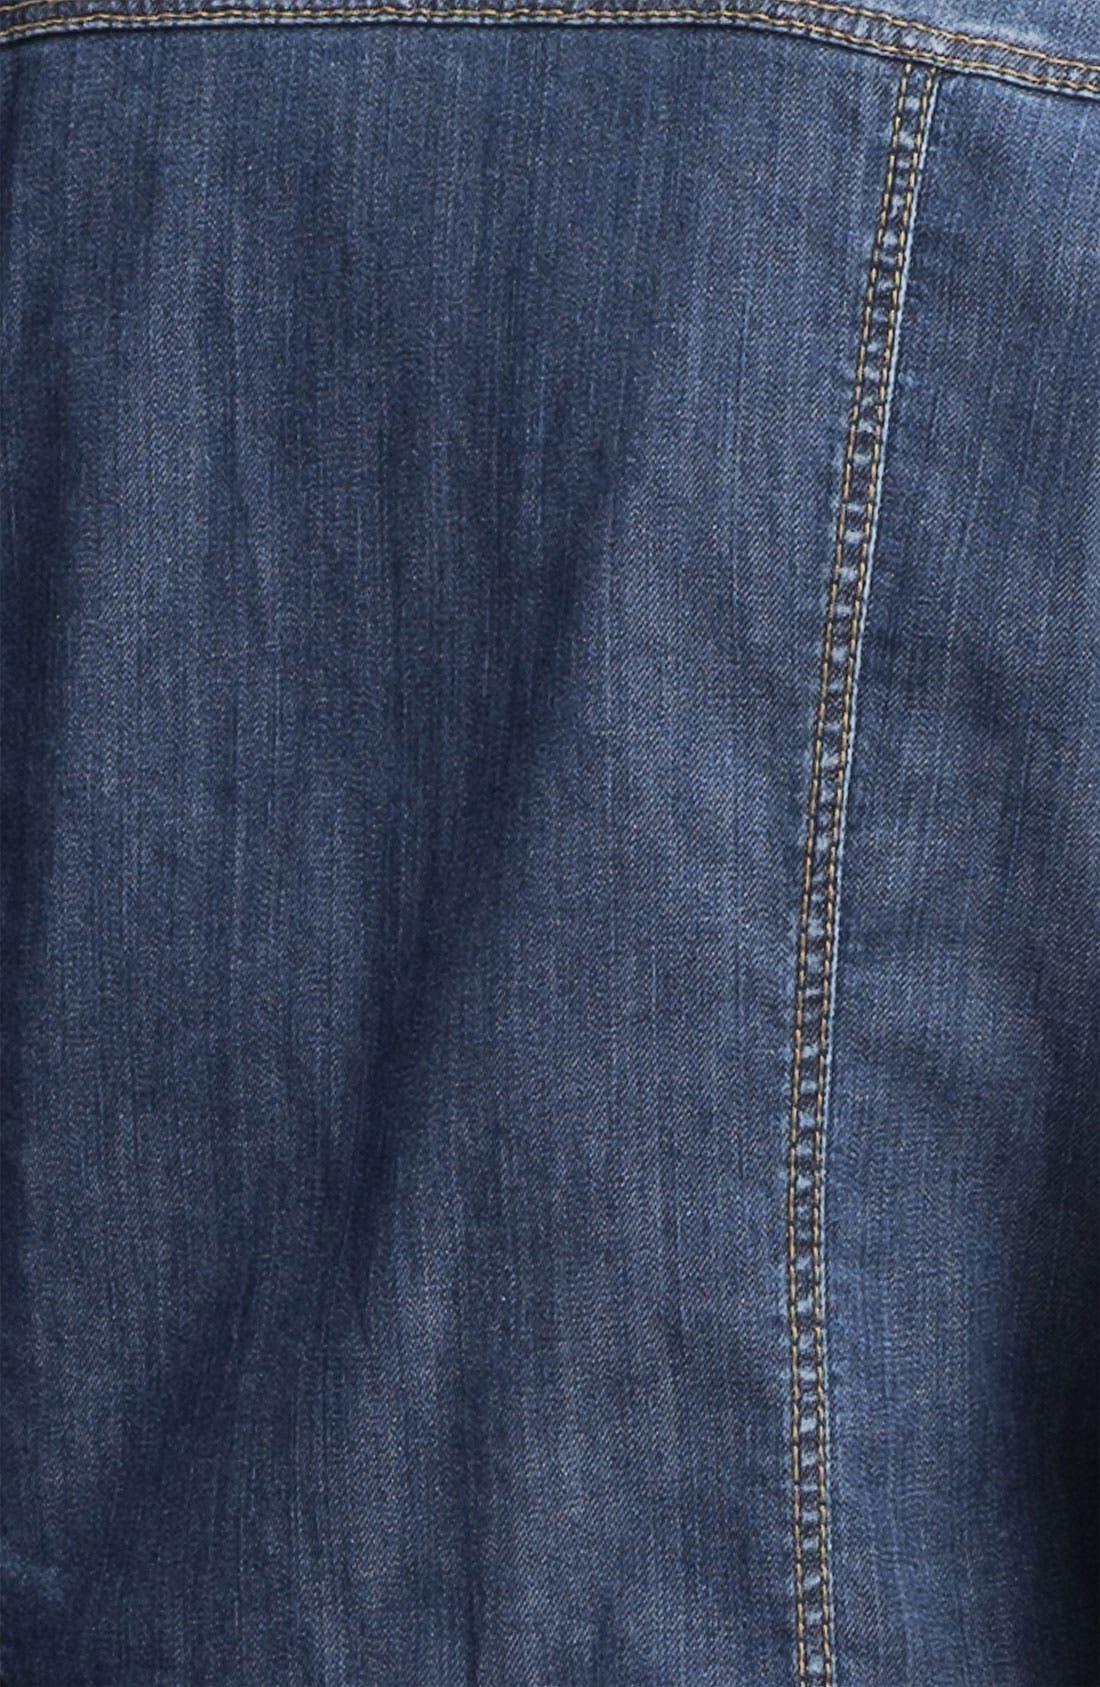 WEEKEND MAX MARA,                             'Victor' Denim Jacket,                             Alternate thumbnail 2, color,                             410